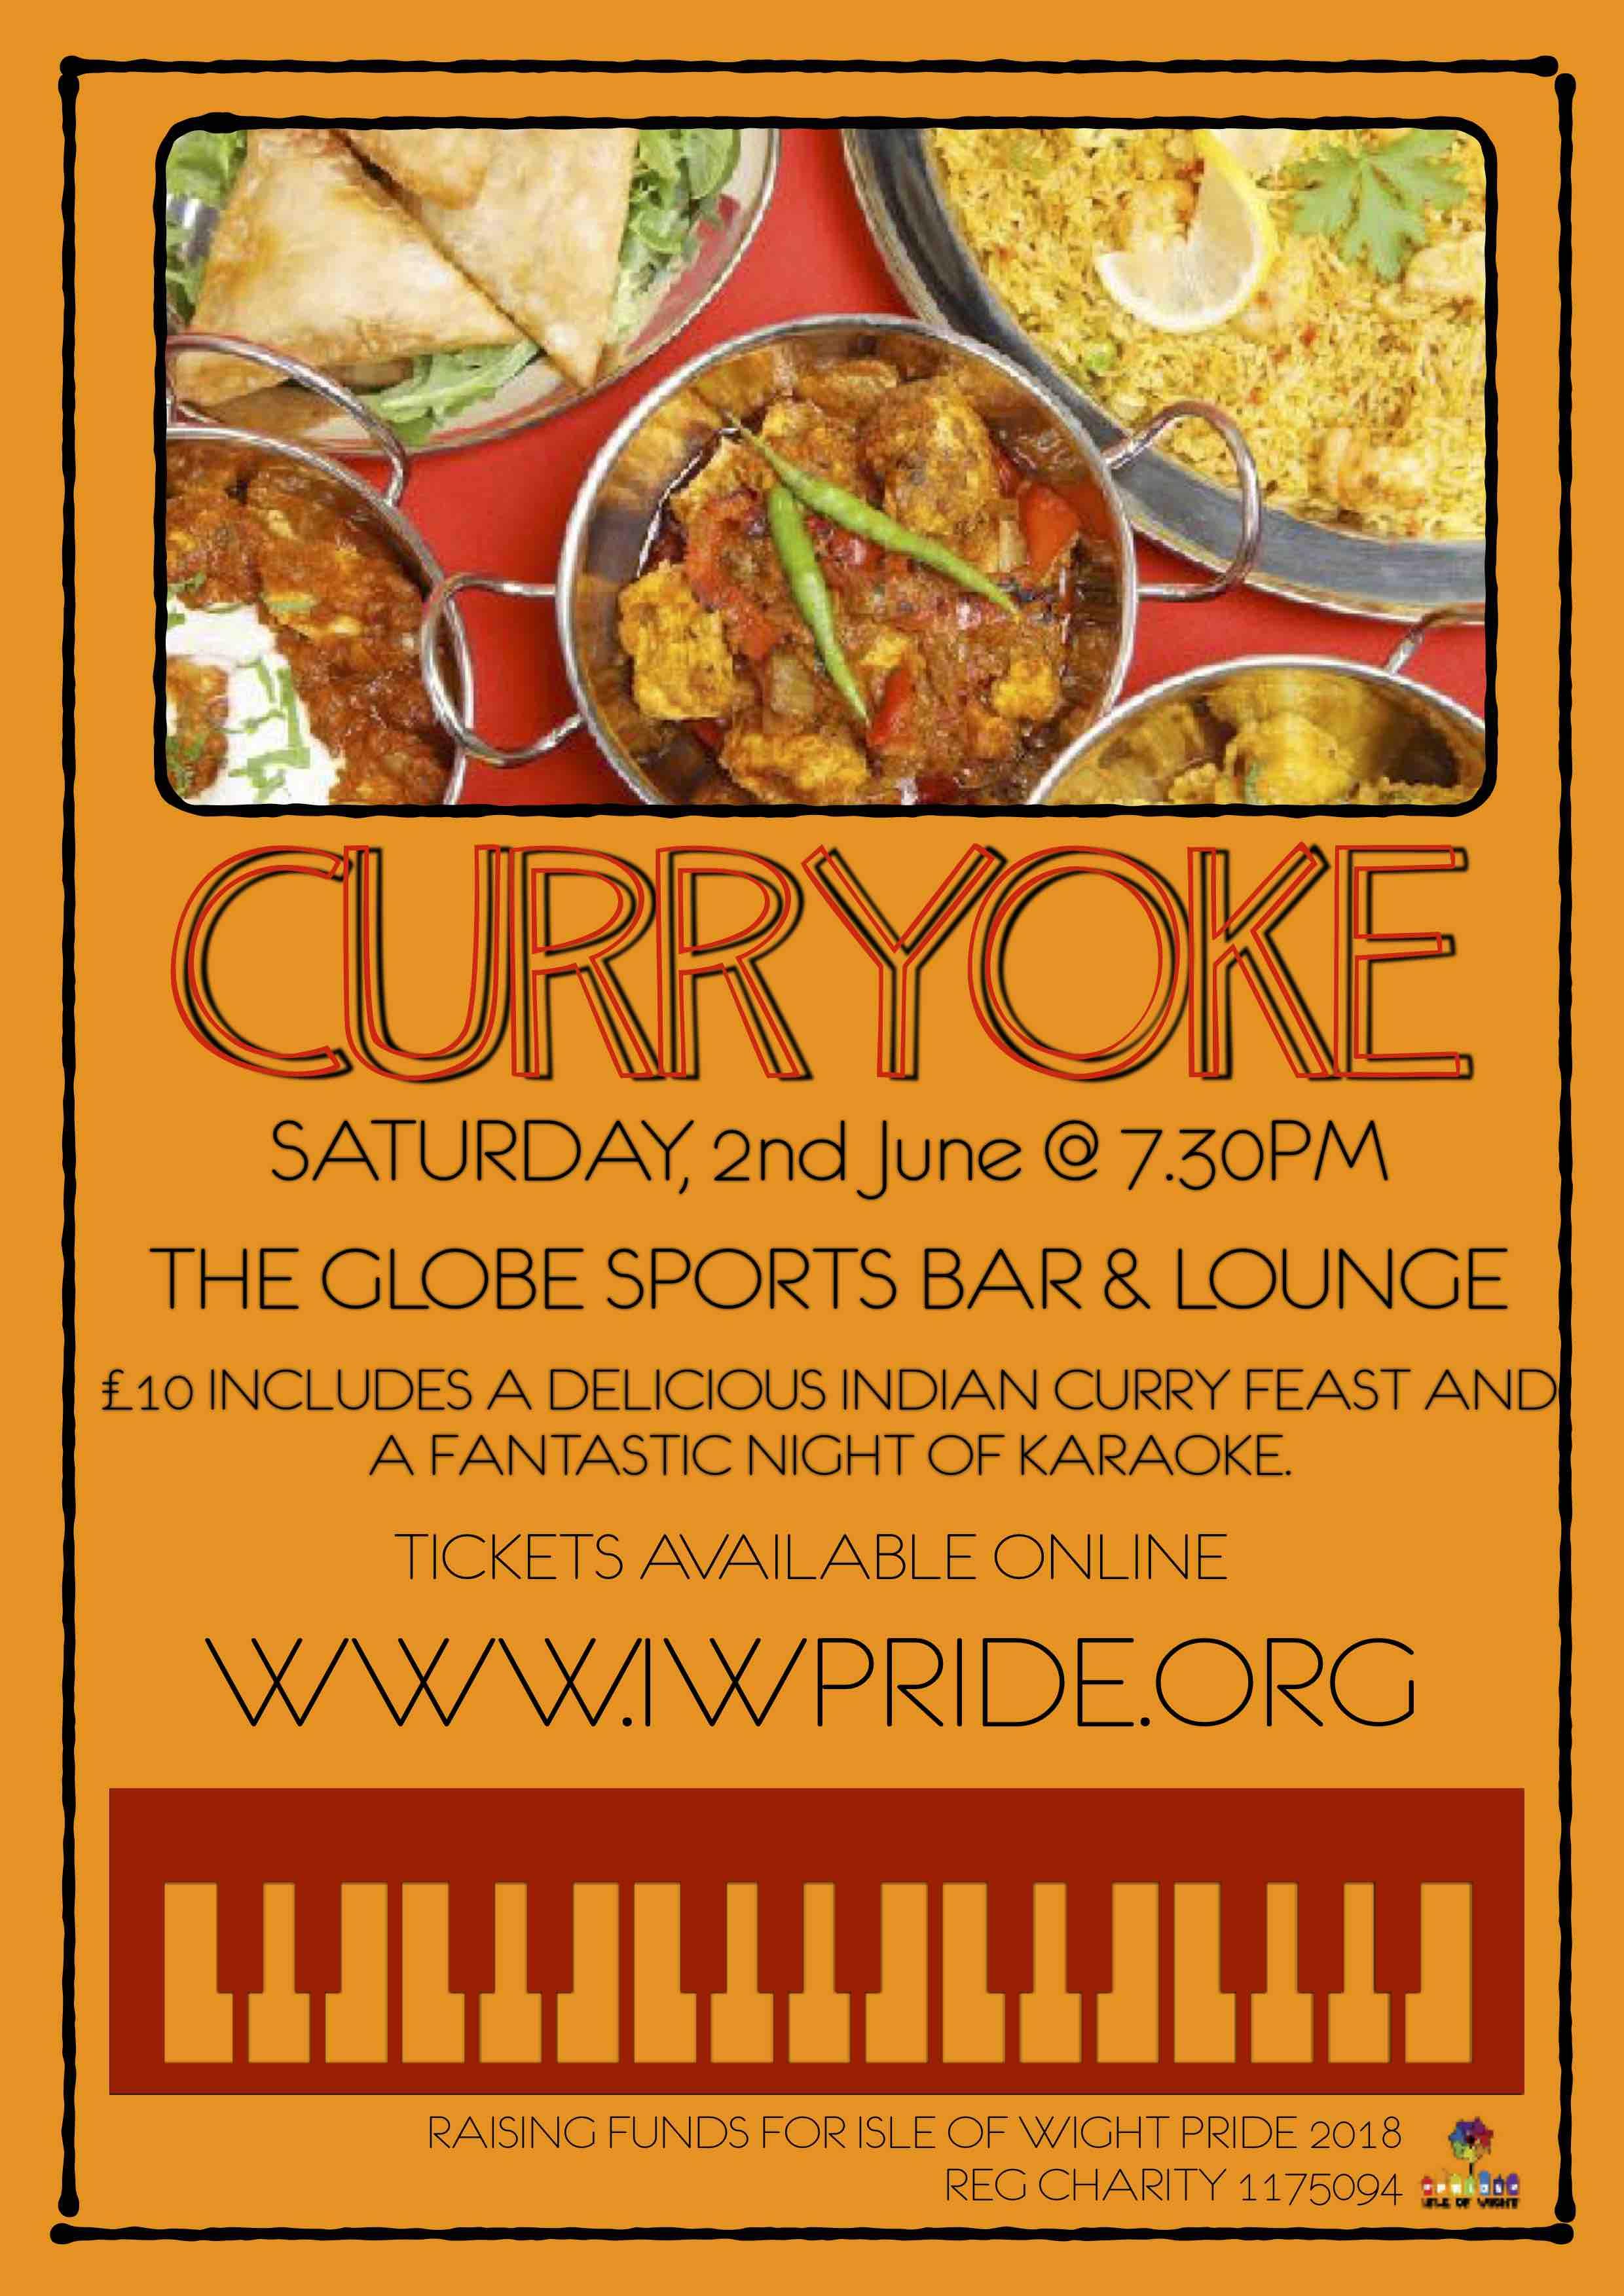 Curryoke returns by popular demand!